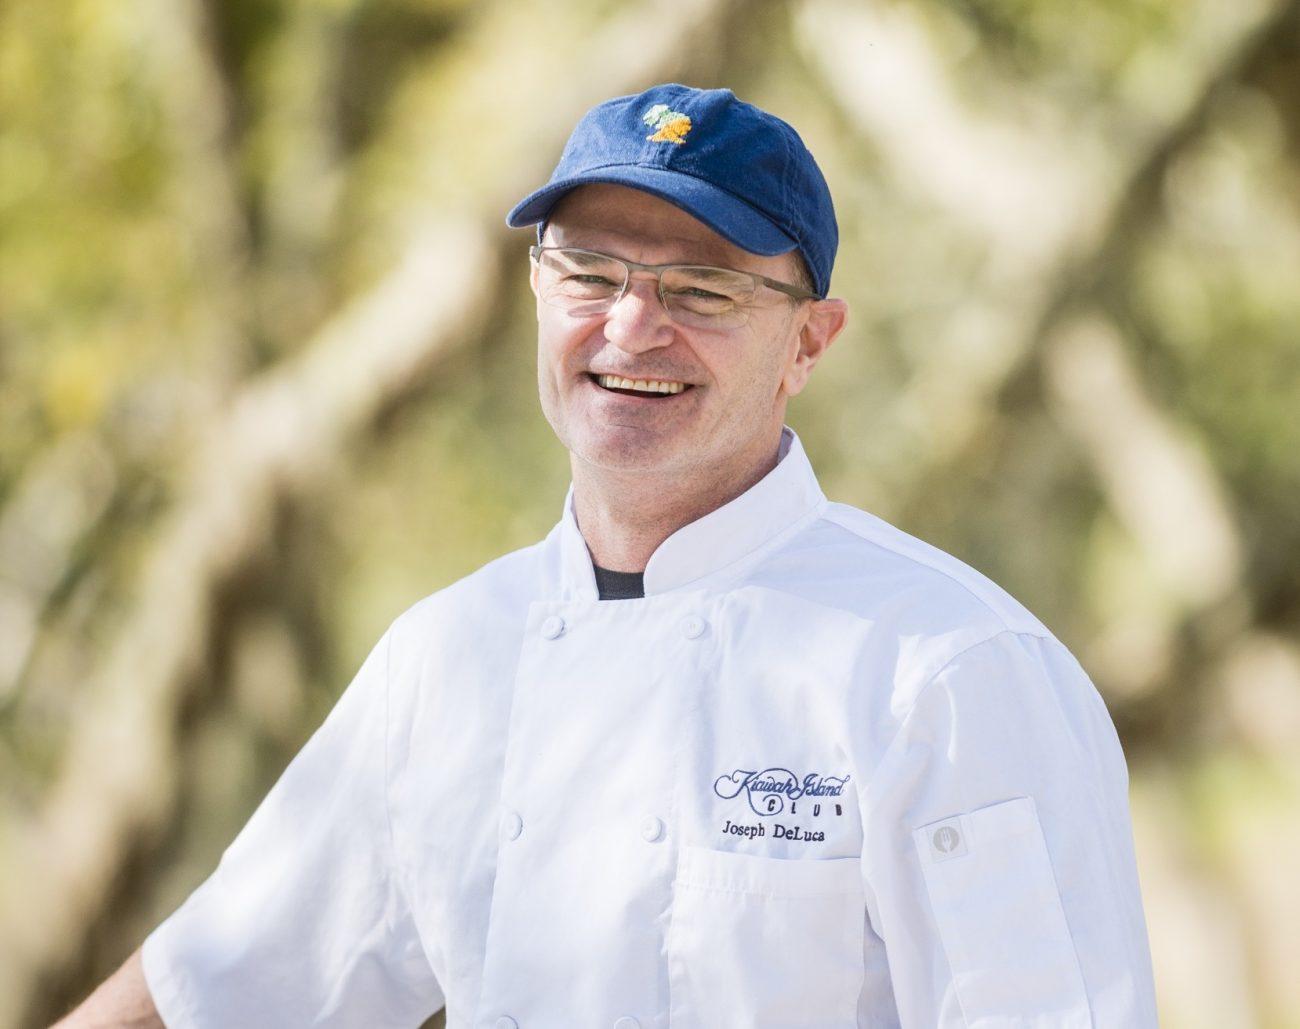 Meet the Chefs of Kiawah Island: Chef DeLuca